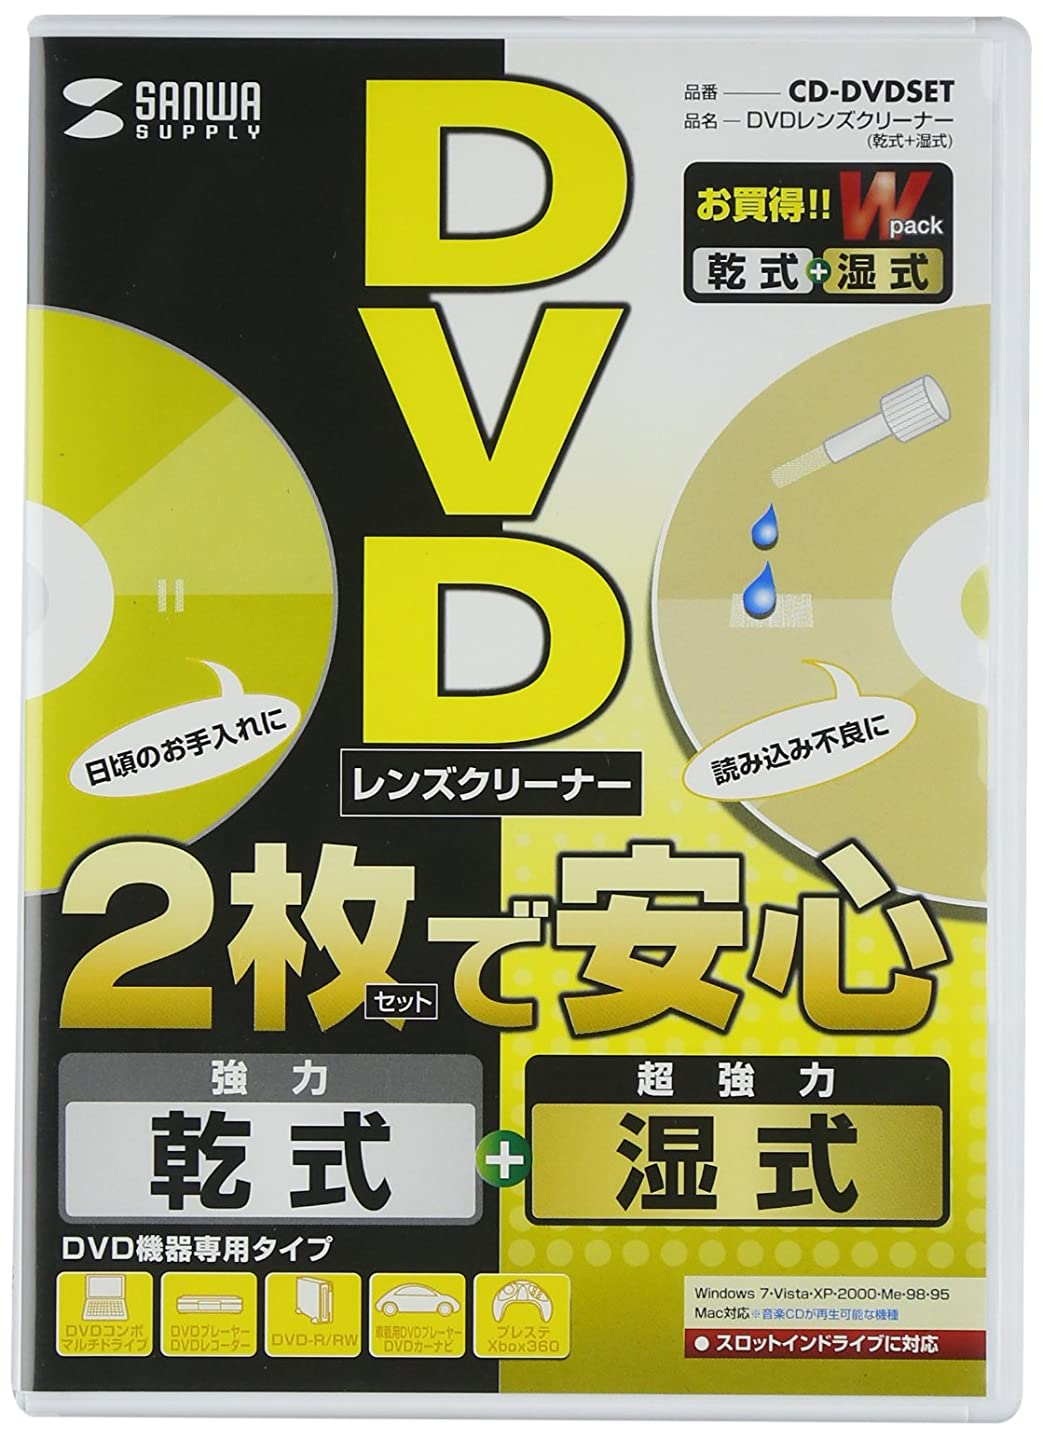 SANWA SUPPLY CD-DVDSET DVD lens cleaner (dry + wet) (japan import)